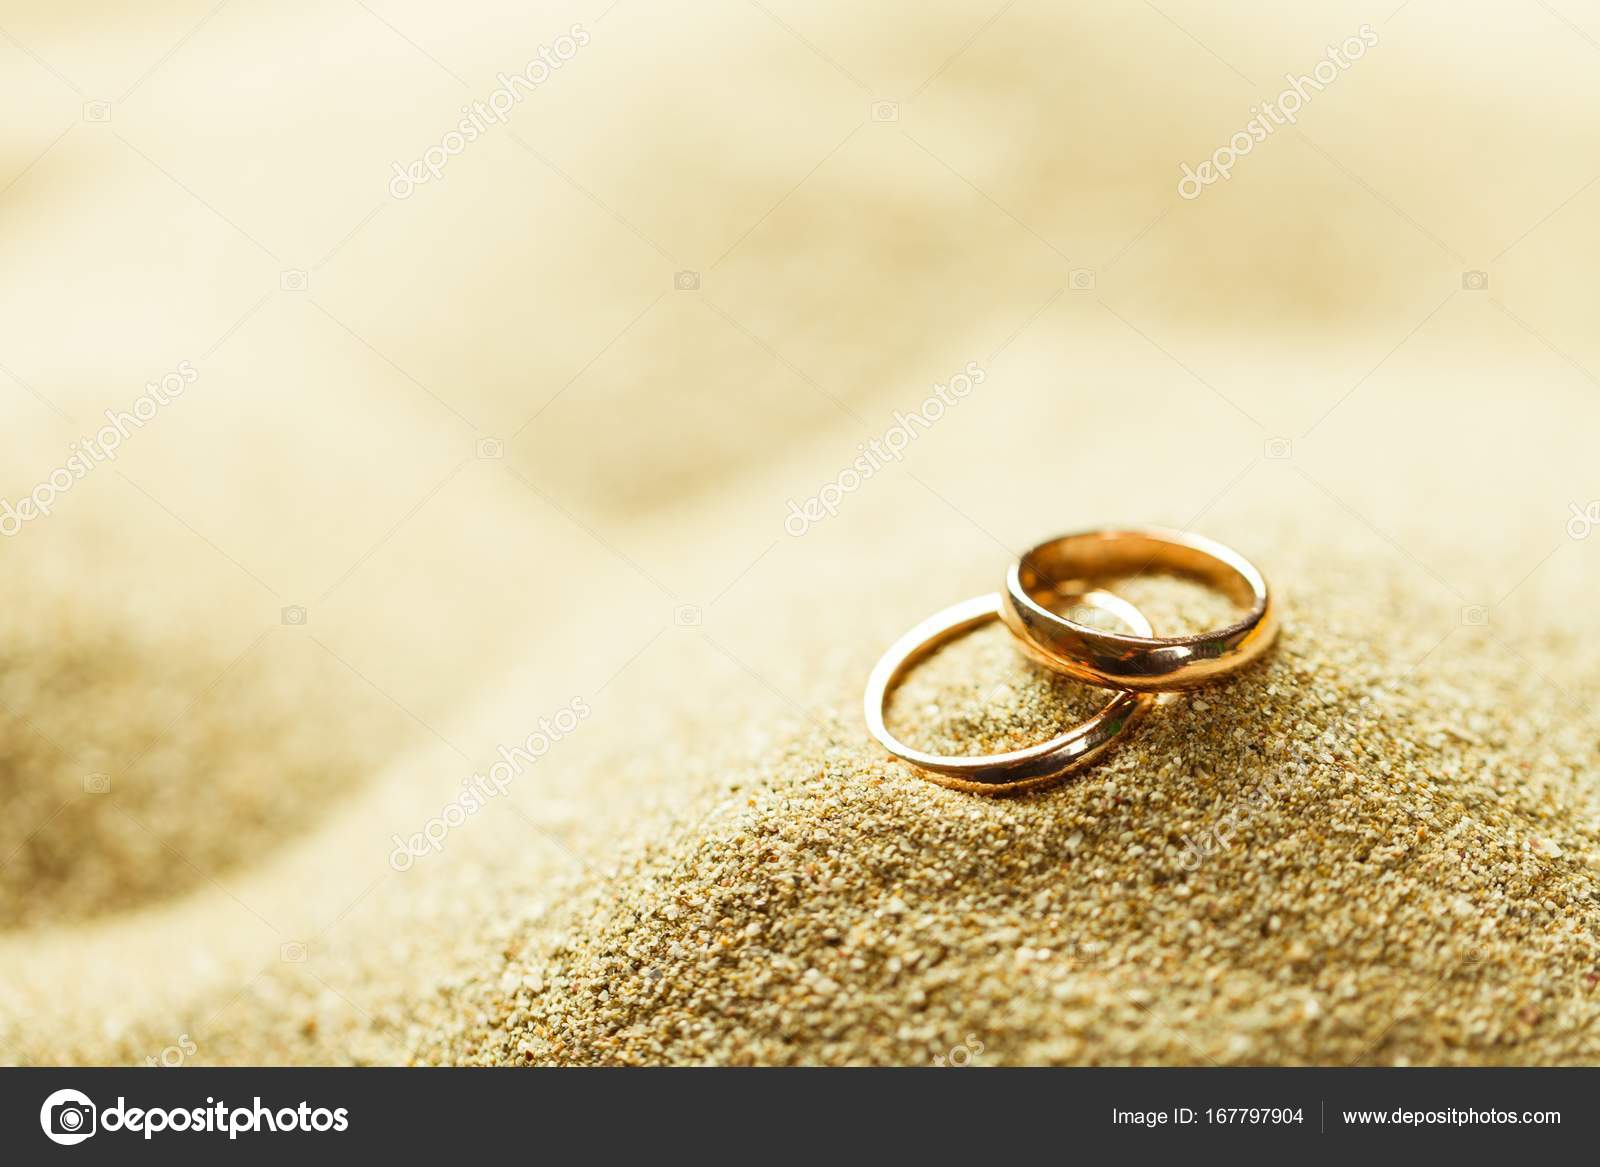 Engagement Rings On Background Stock Photo C Billiondigital 167797904